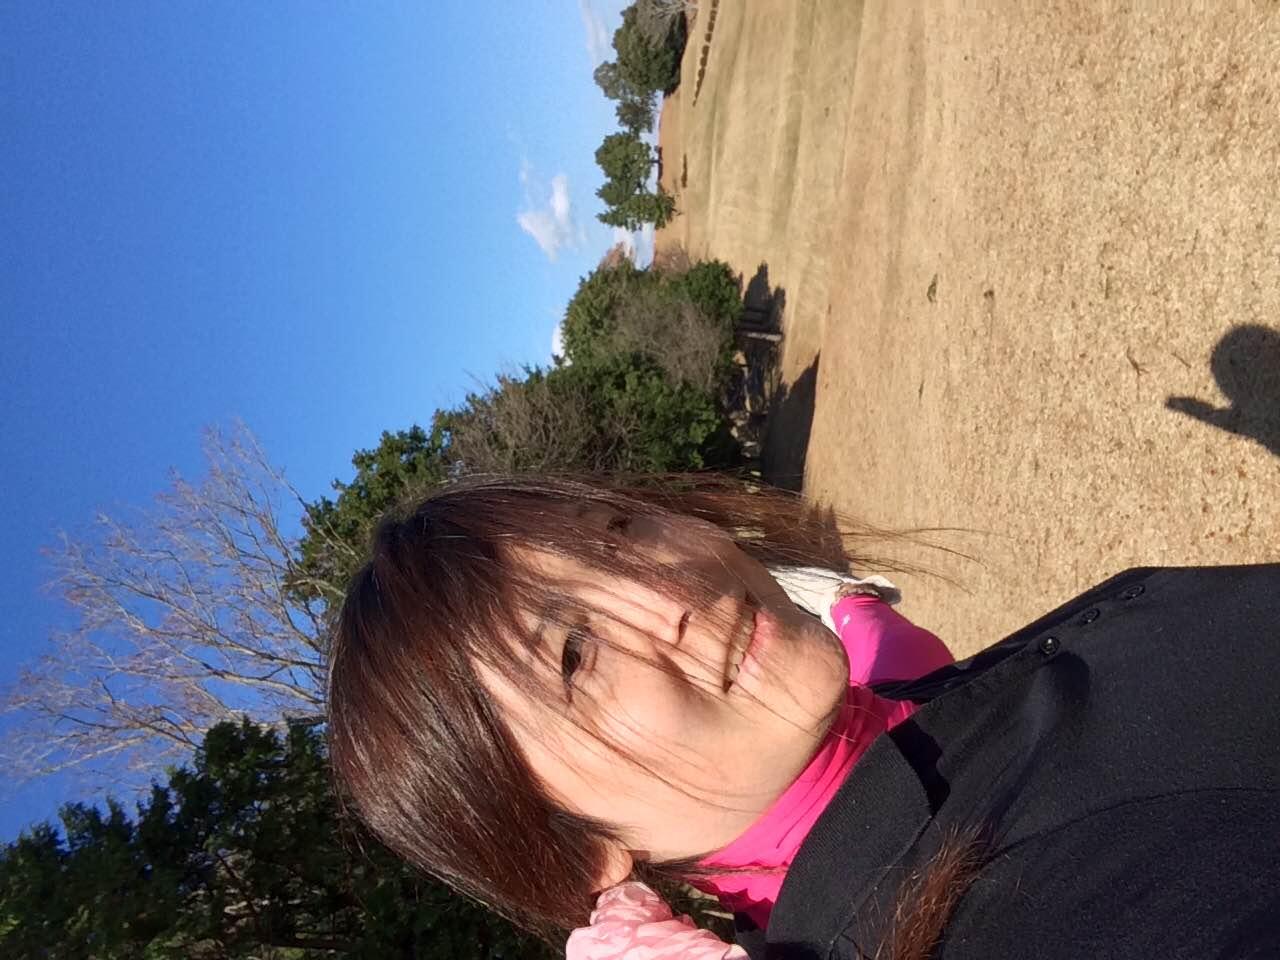 1/2014120810564301-IMG_2054-small.jpg